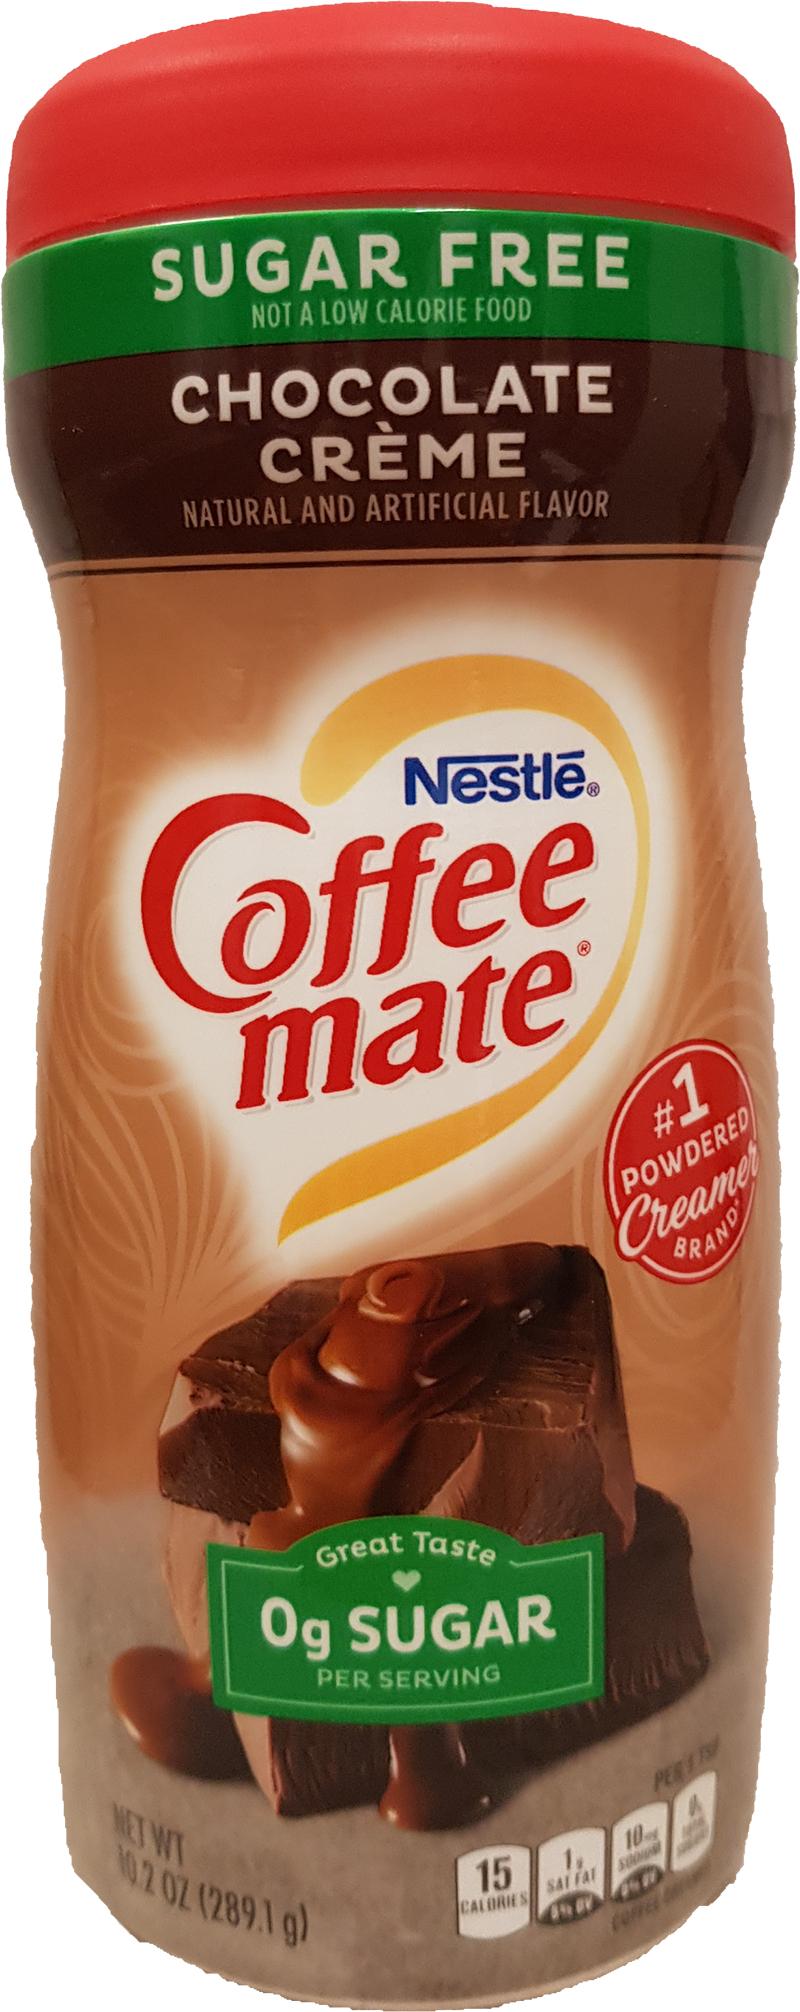 Nestle Coffeemate Chocolate Creme sugar free